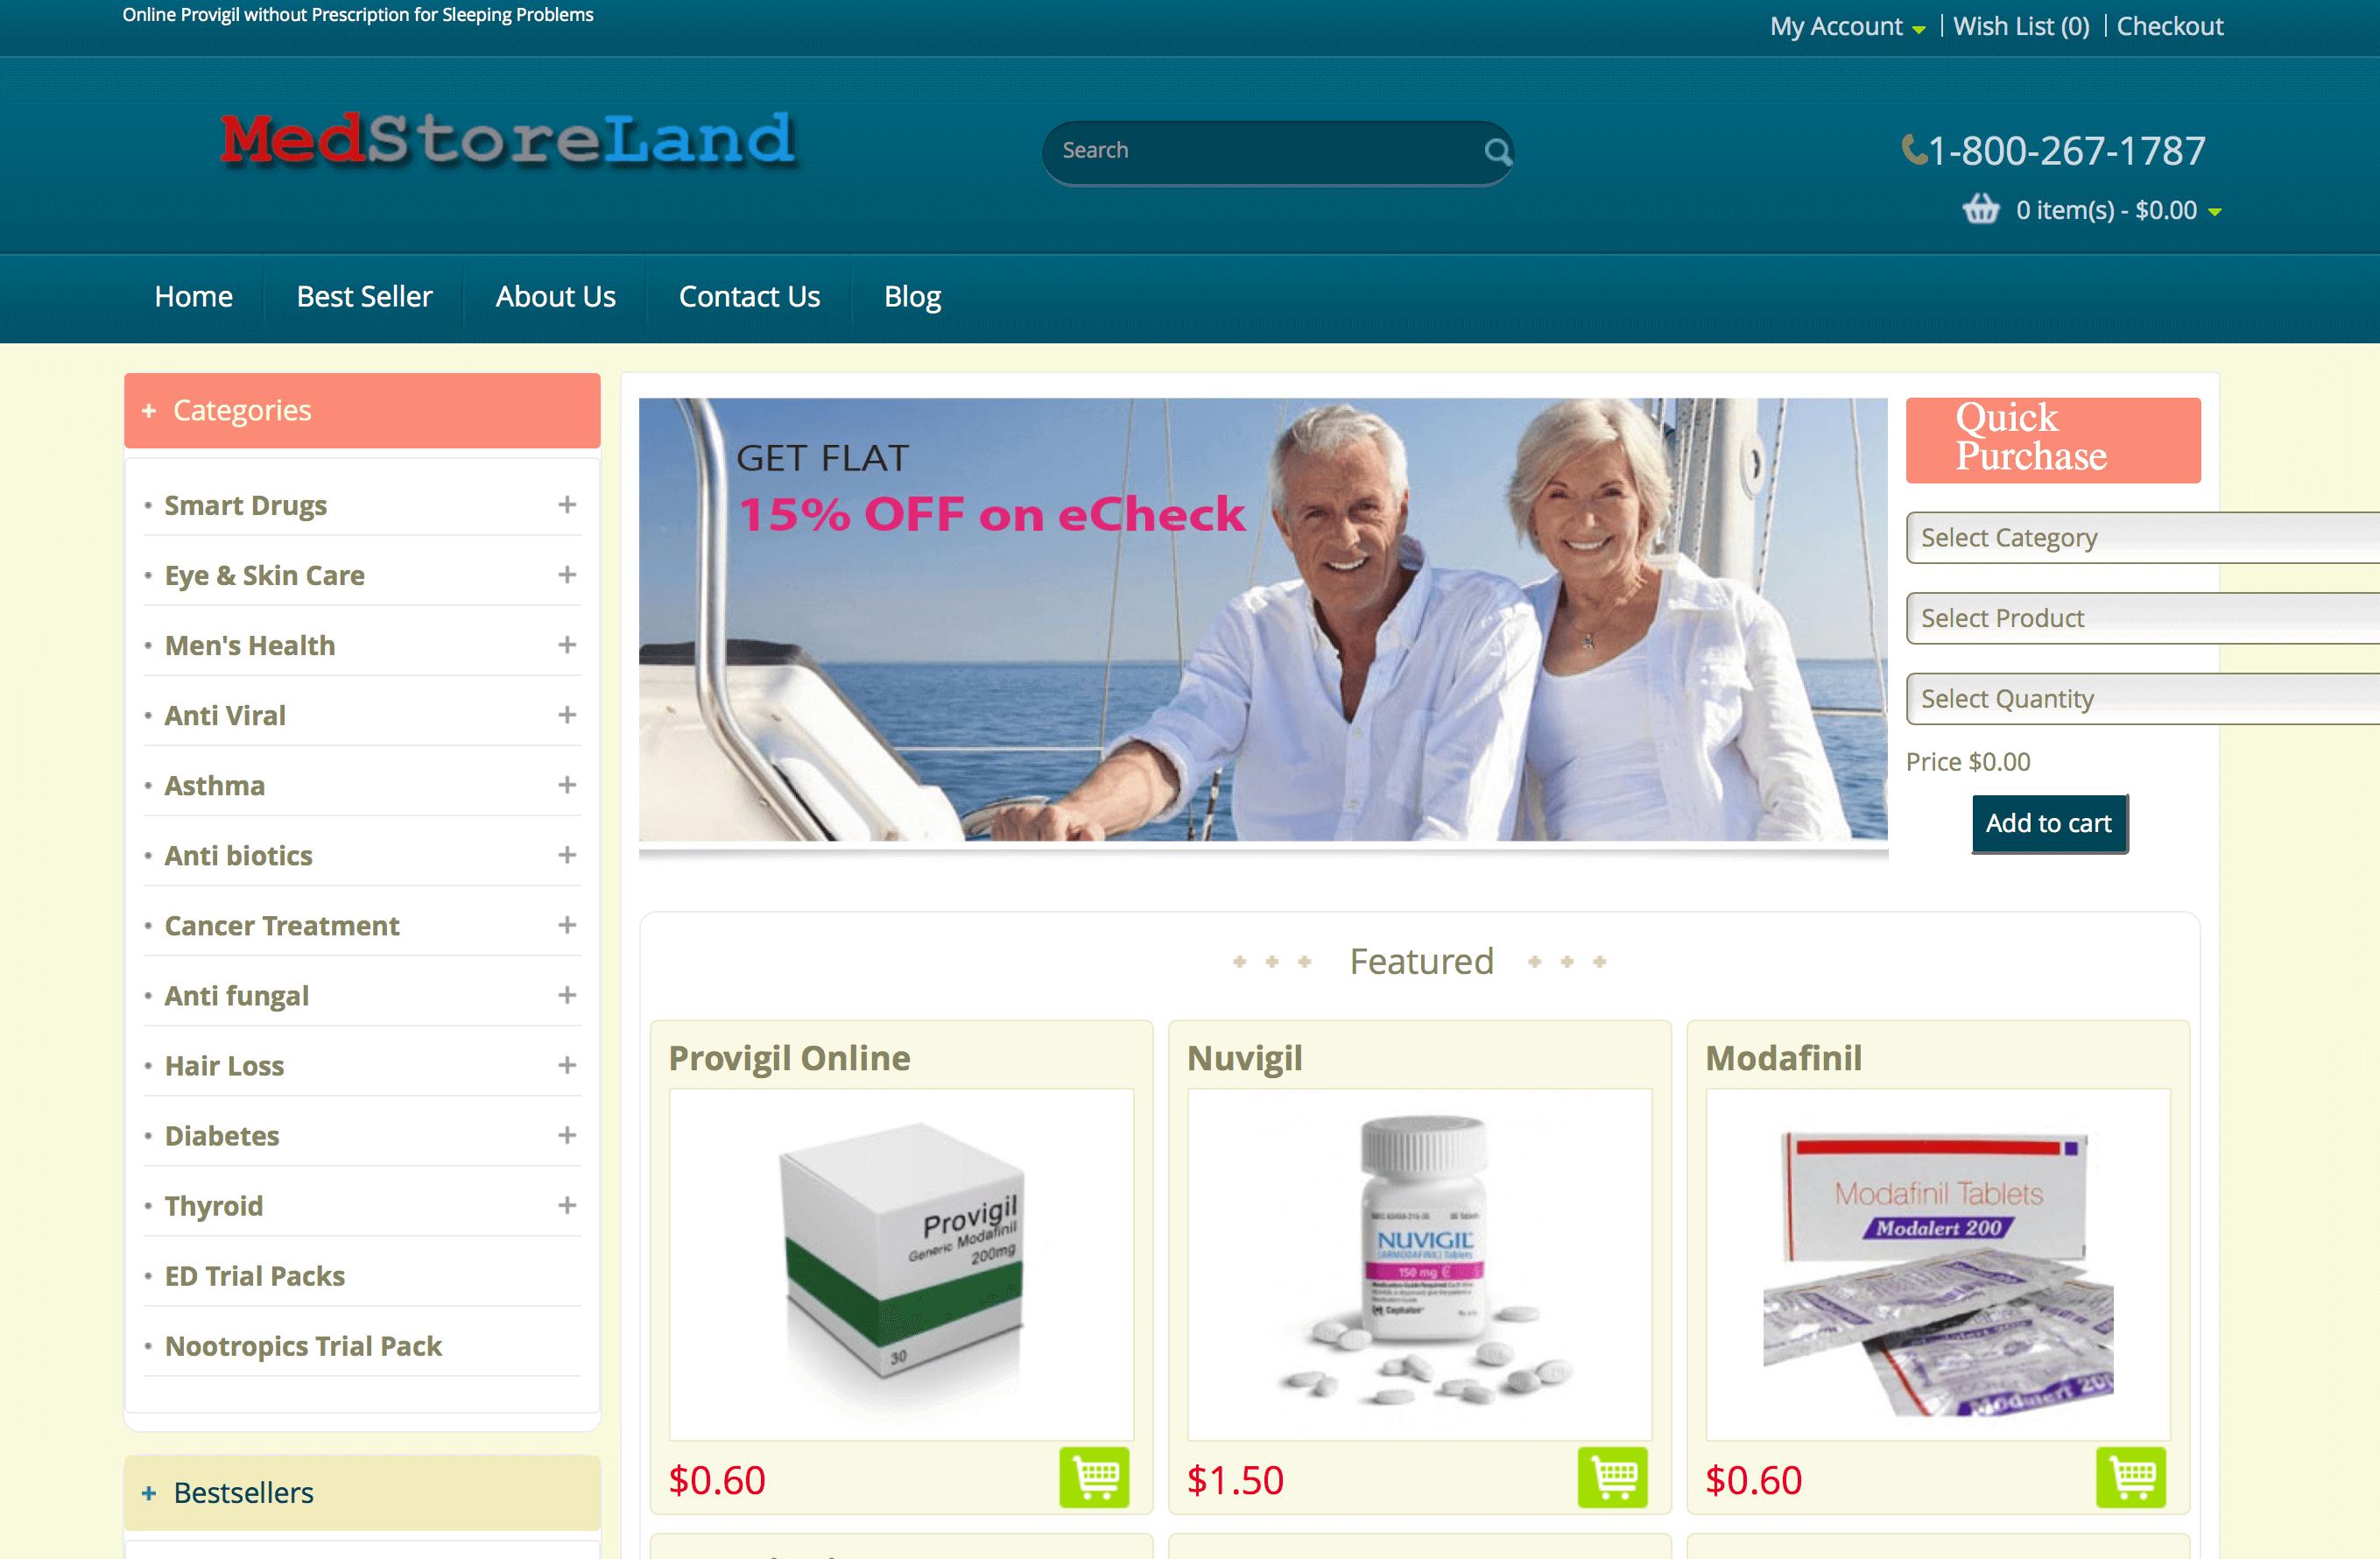 MedstoreLand.com Pharmacy Review